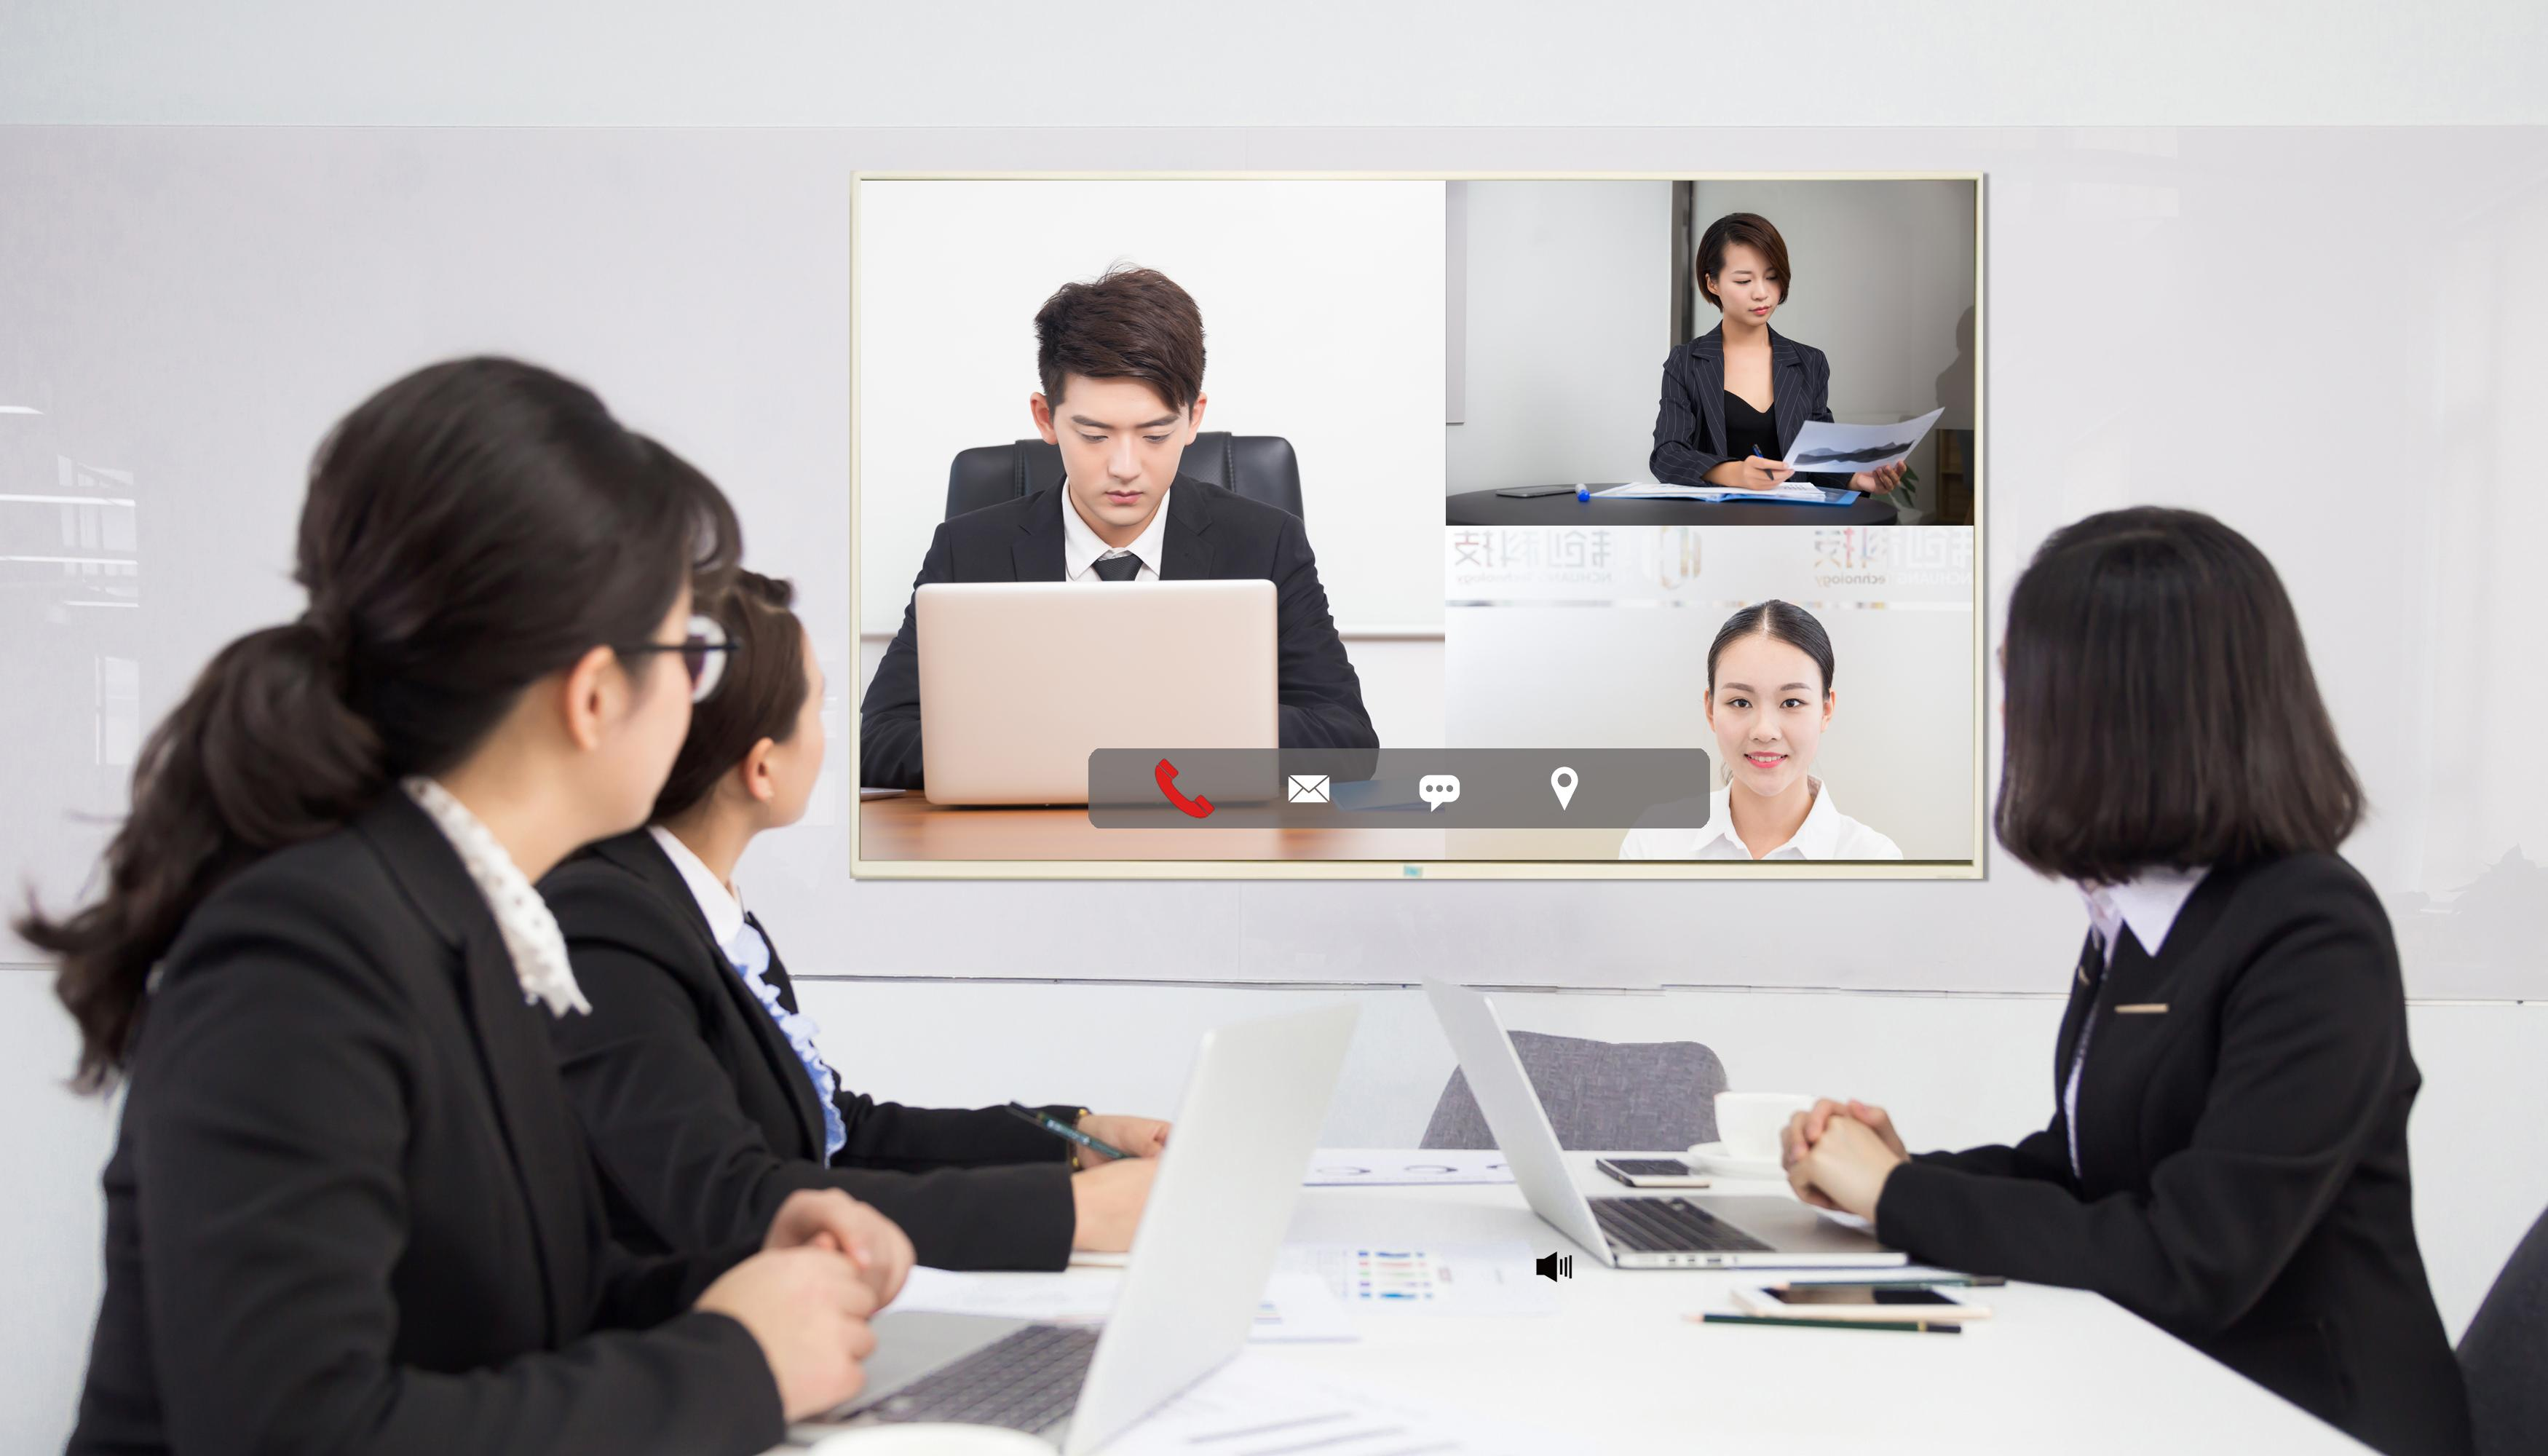 vymeet远程视频会议是企业实现内部高效办公信息化的首选产品 第2张